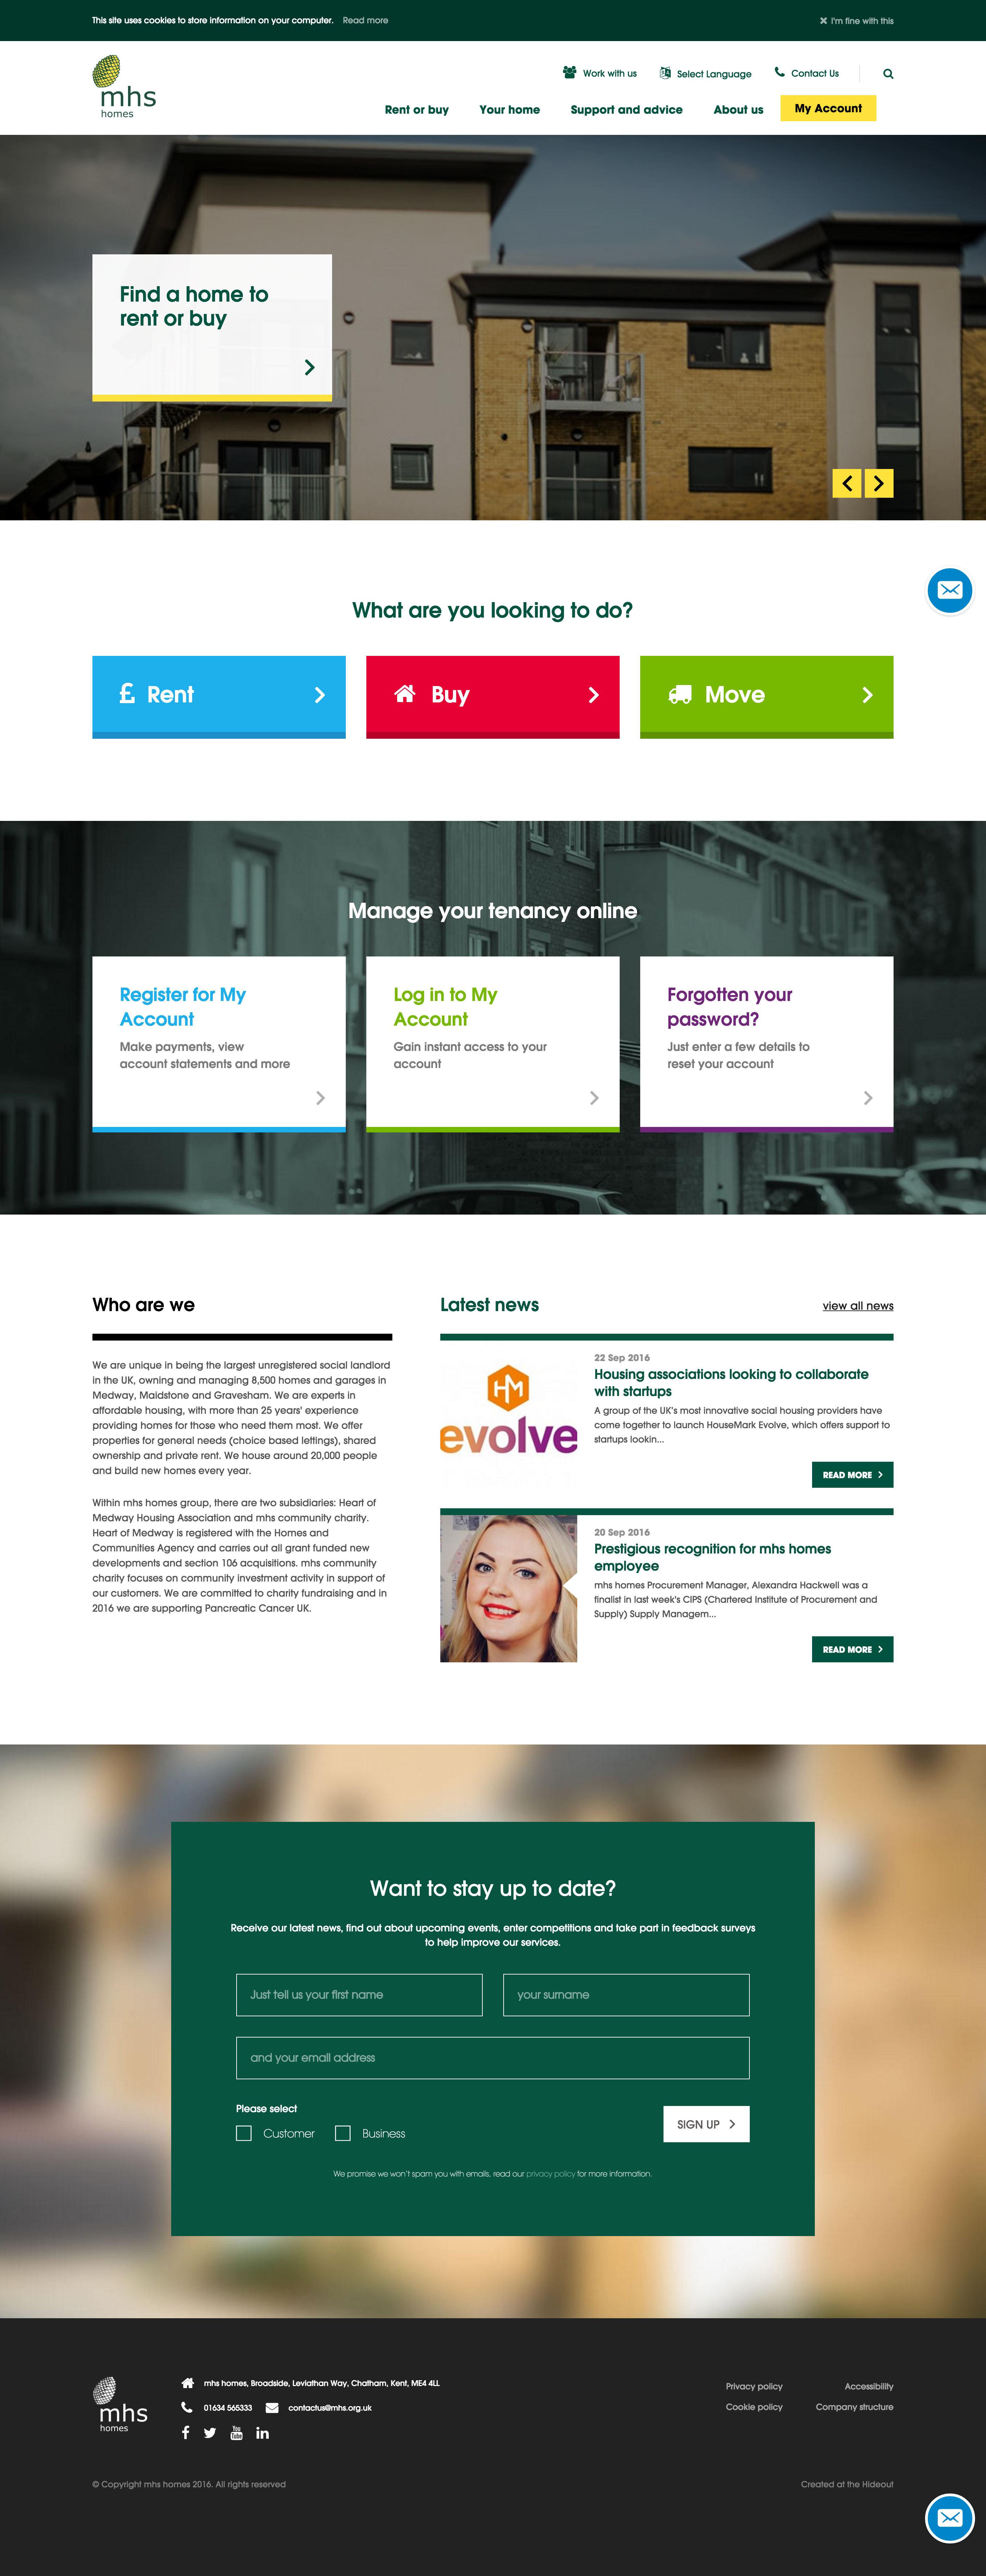 desktop-site-example-mhs